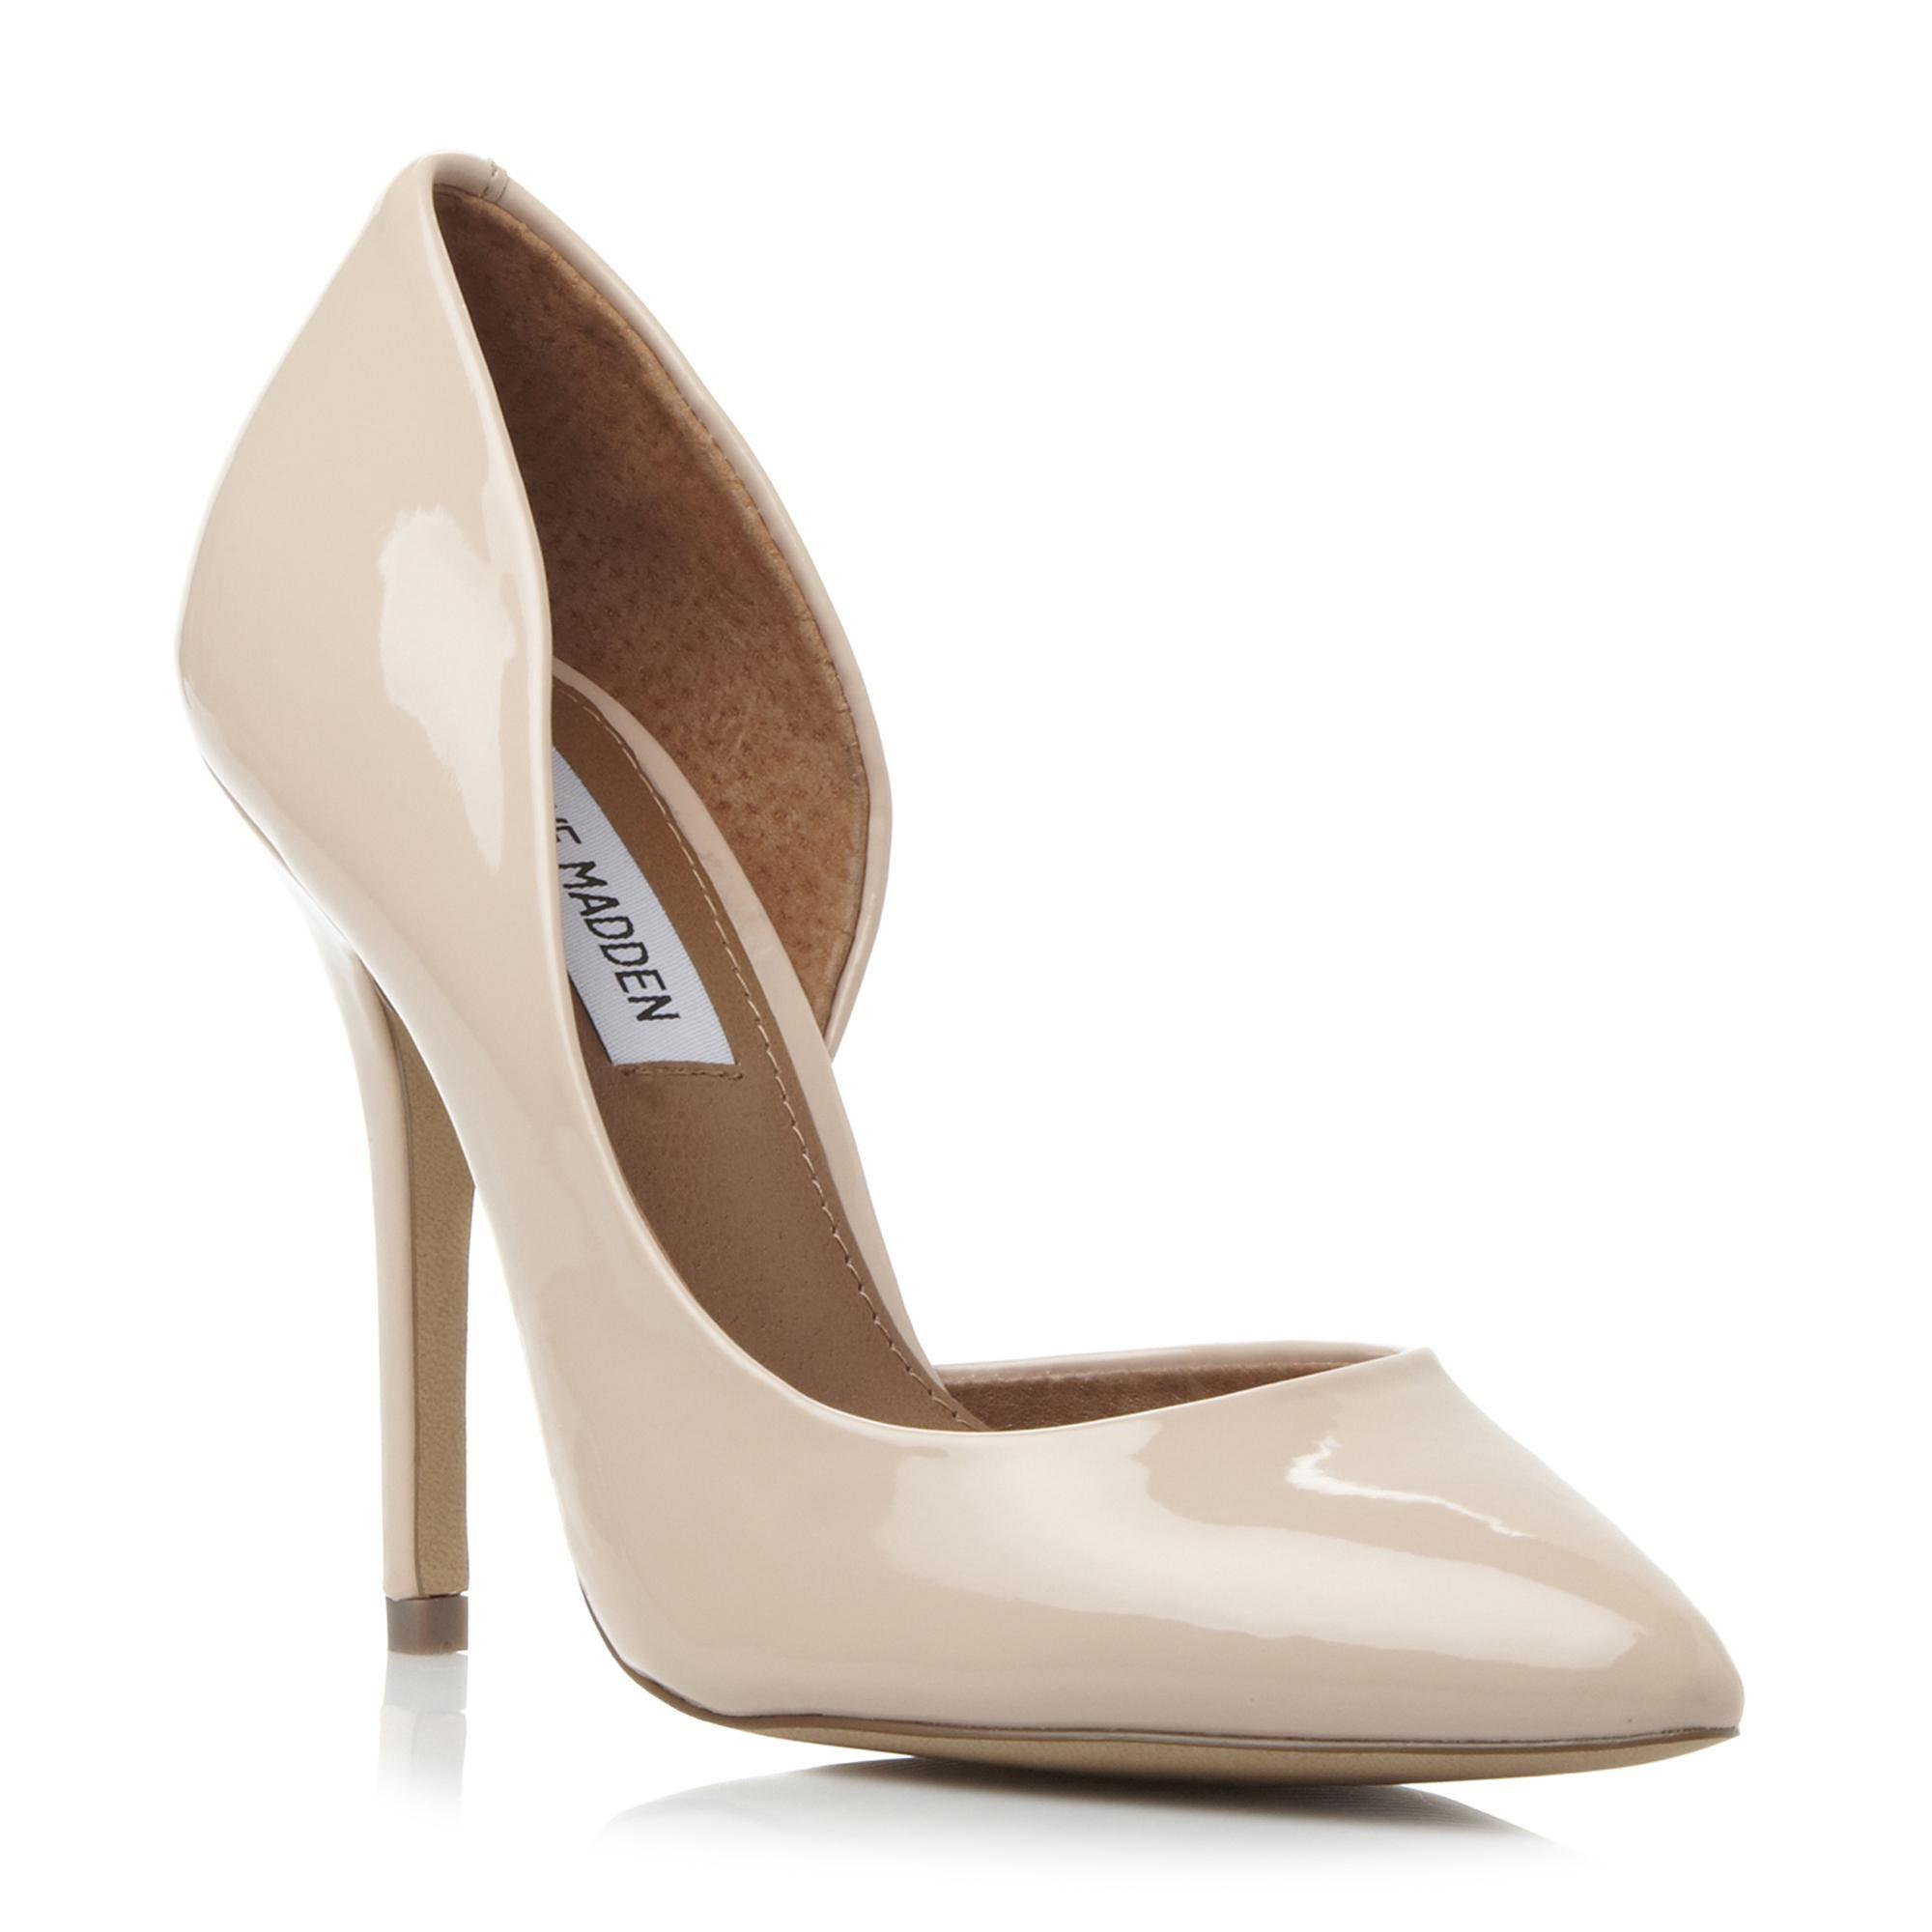 64da119450f STEVE MADDEN GAYYLE SM - Semi D'Orsay High Heeled Court Shoe - nude ...